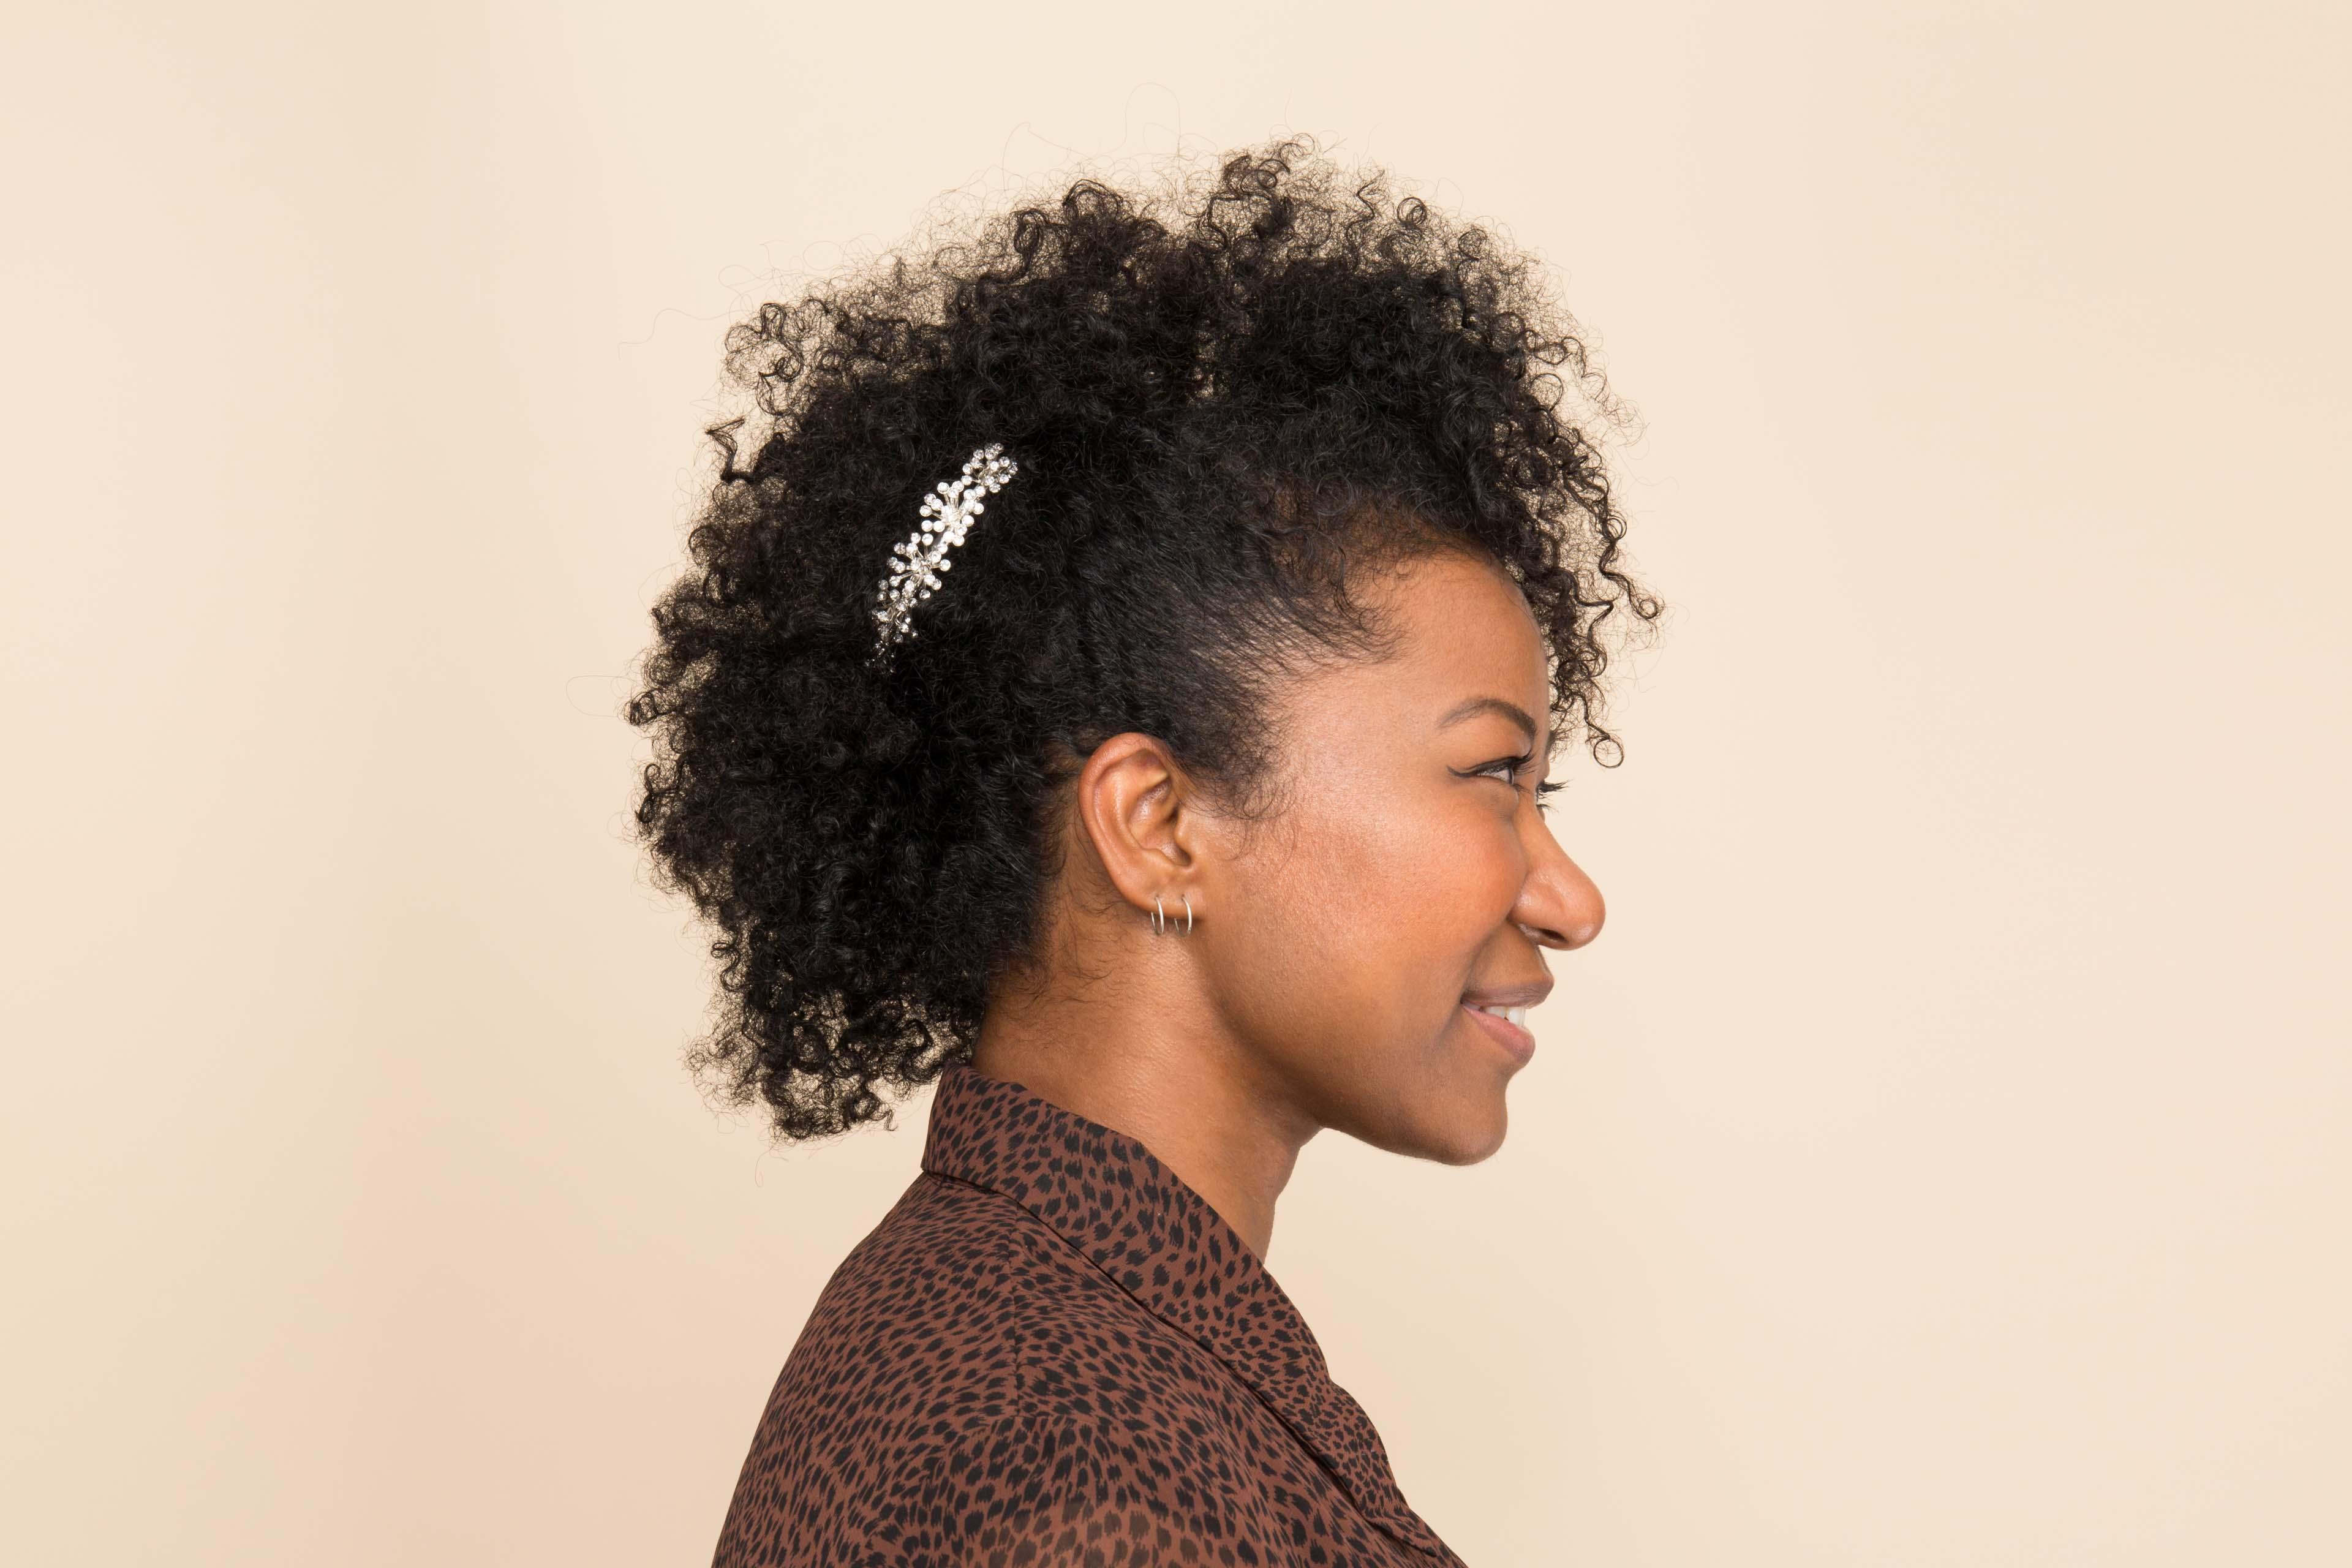 modelo de cabelos cacheados de festa com moicano